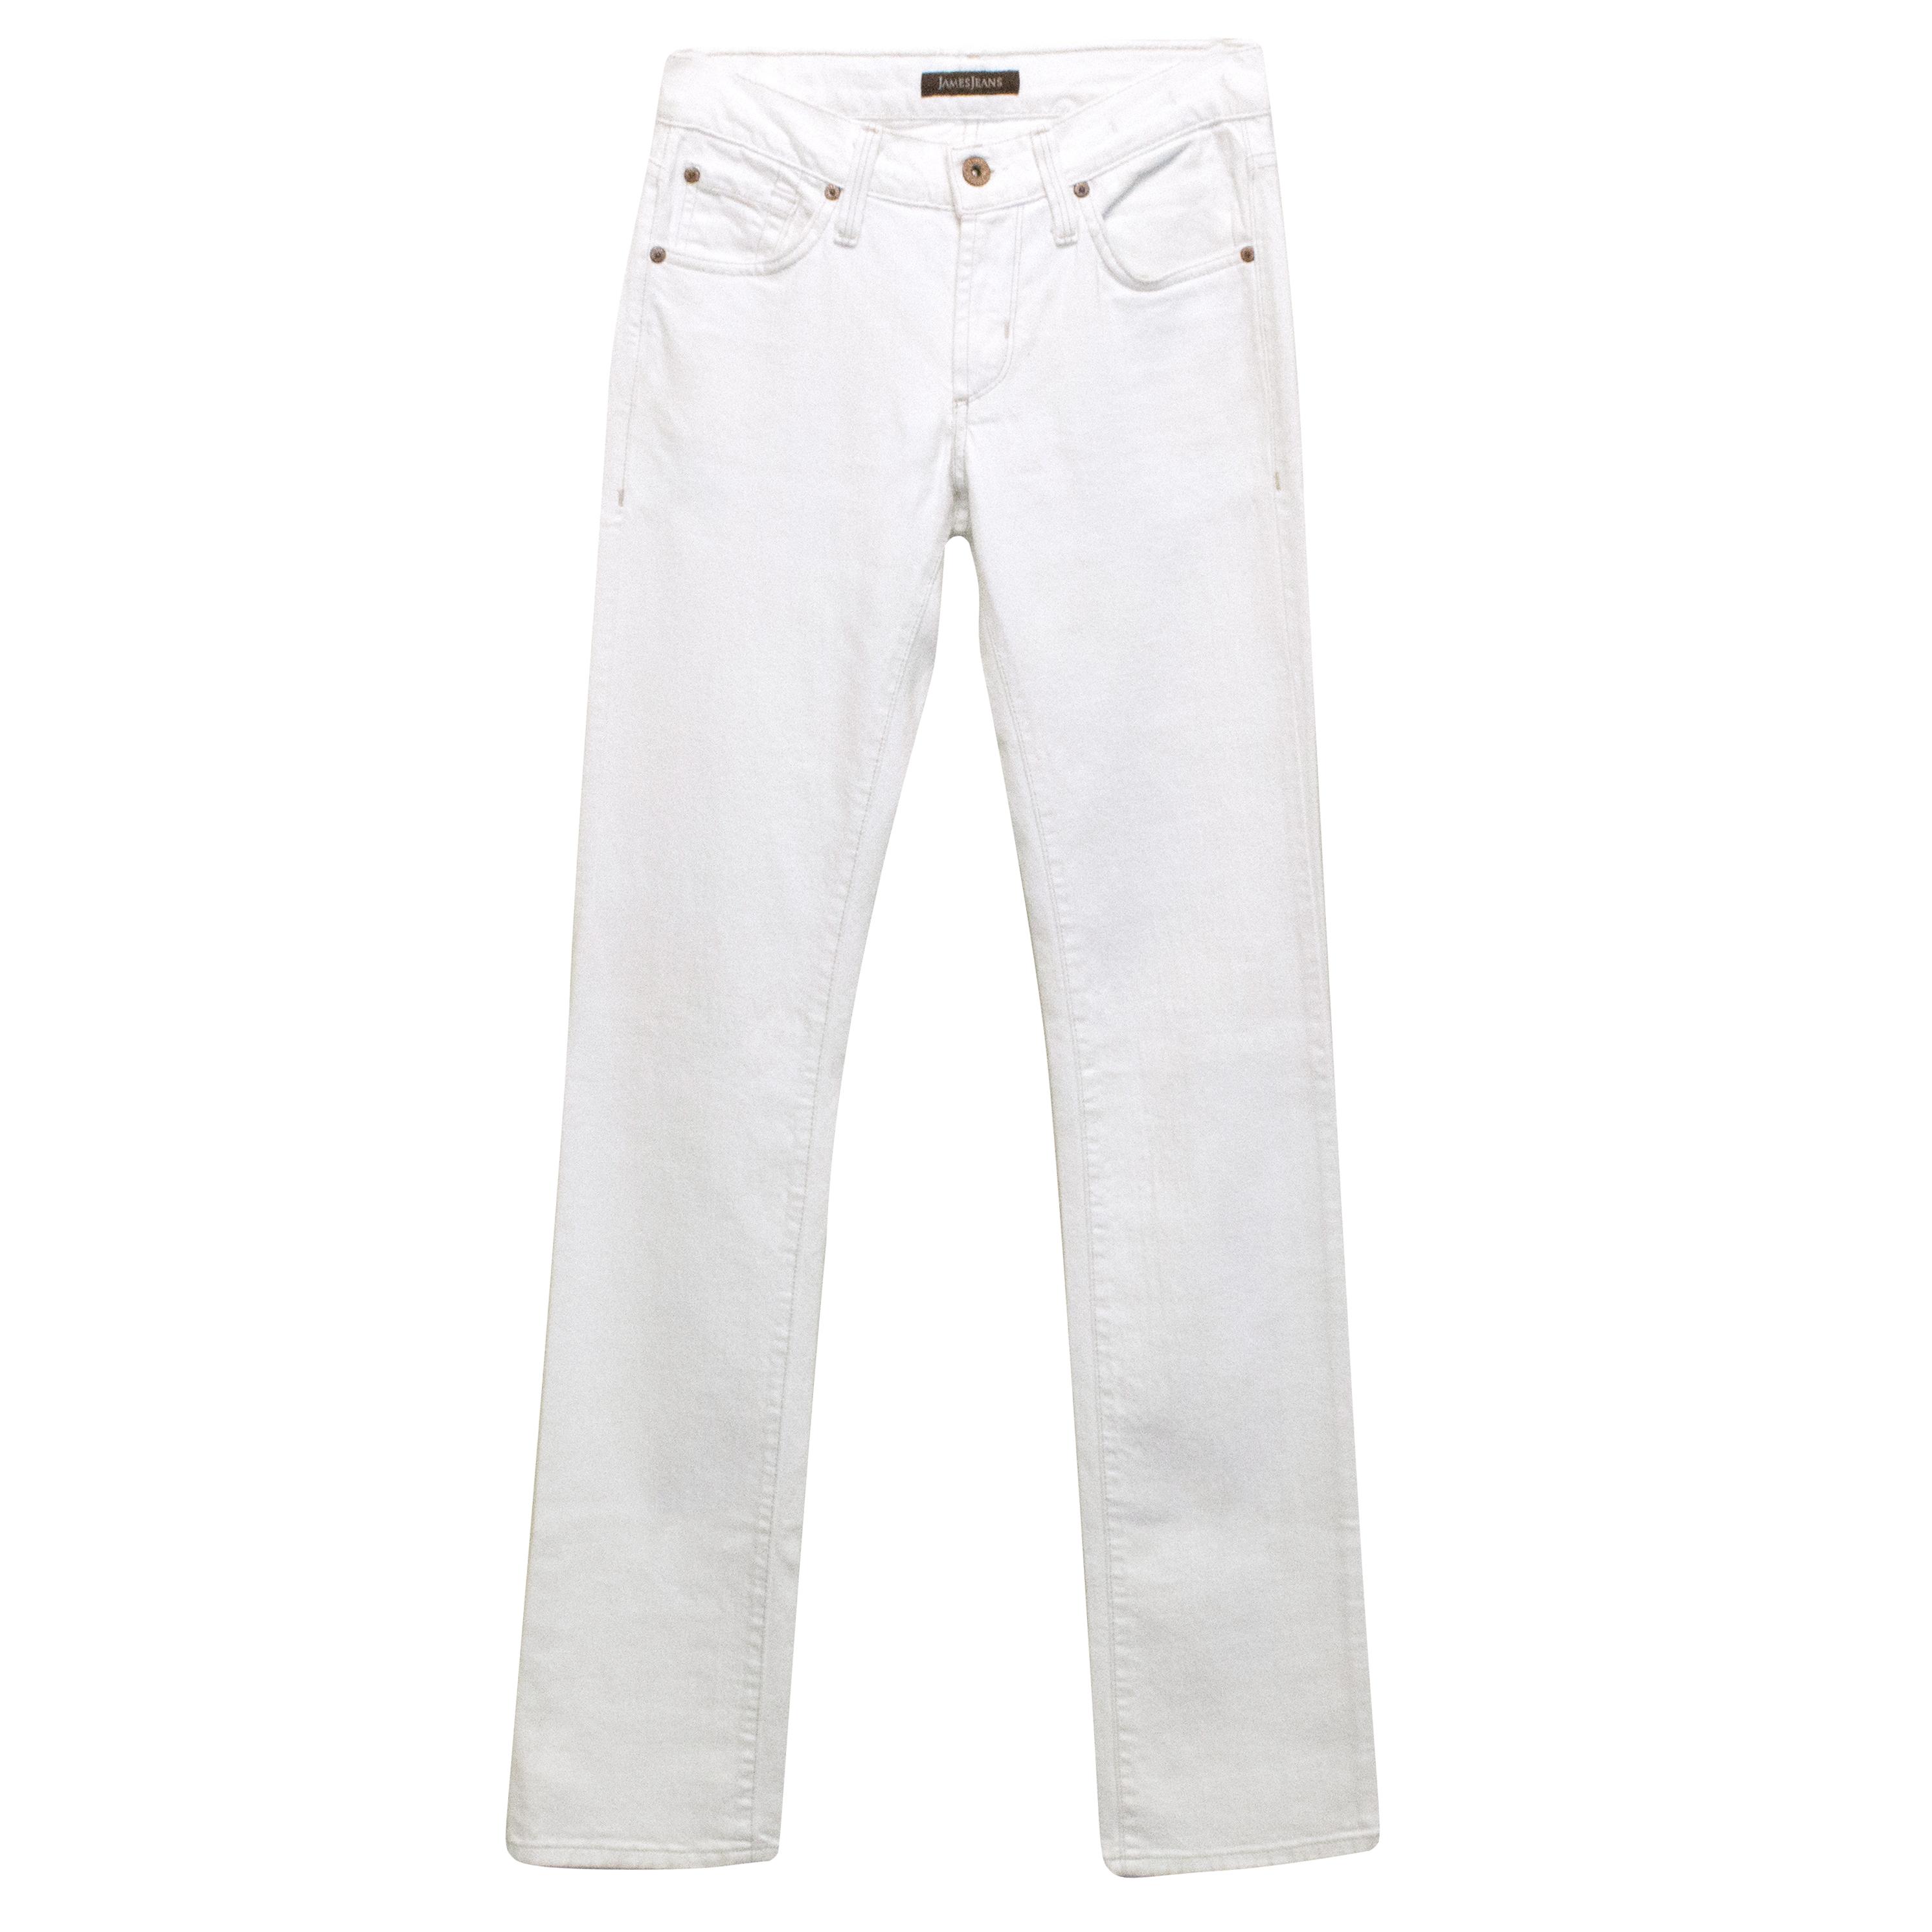 James Jeans 'Hunter' White Jeans